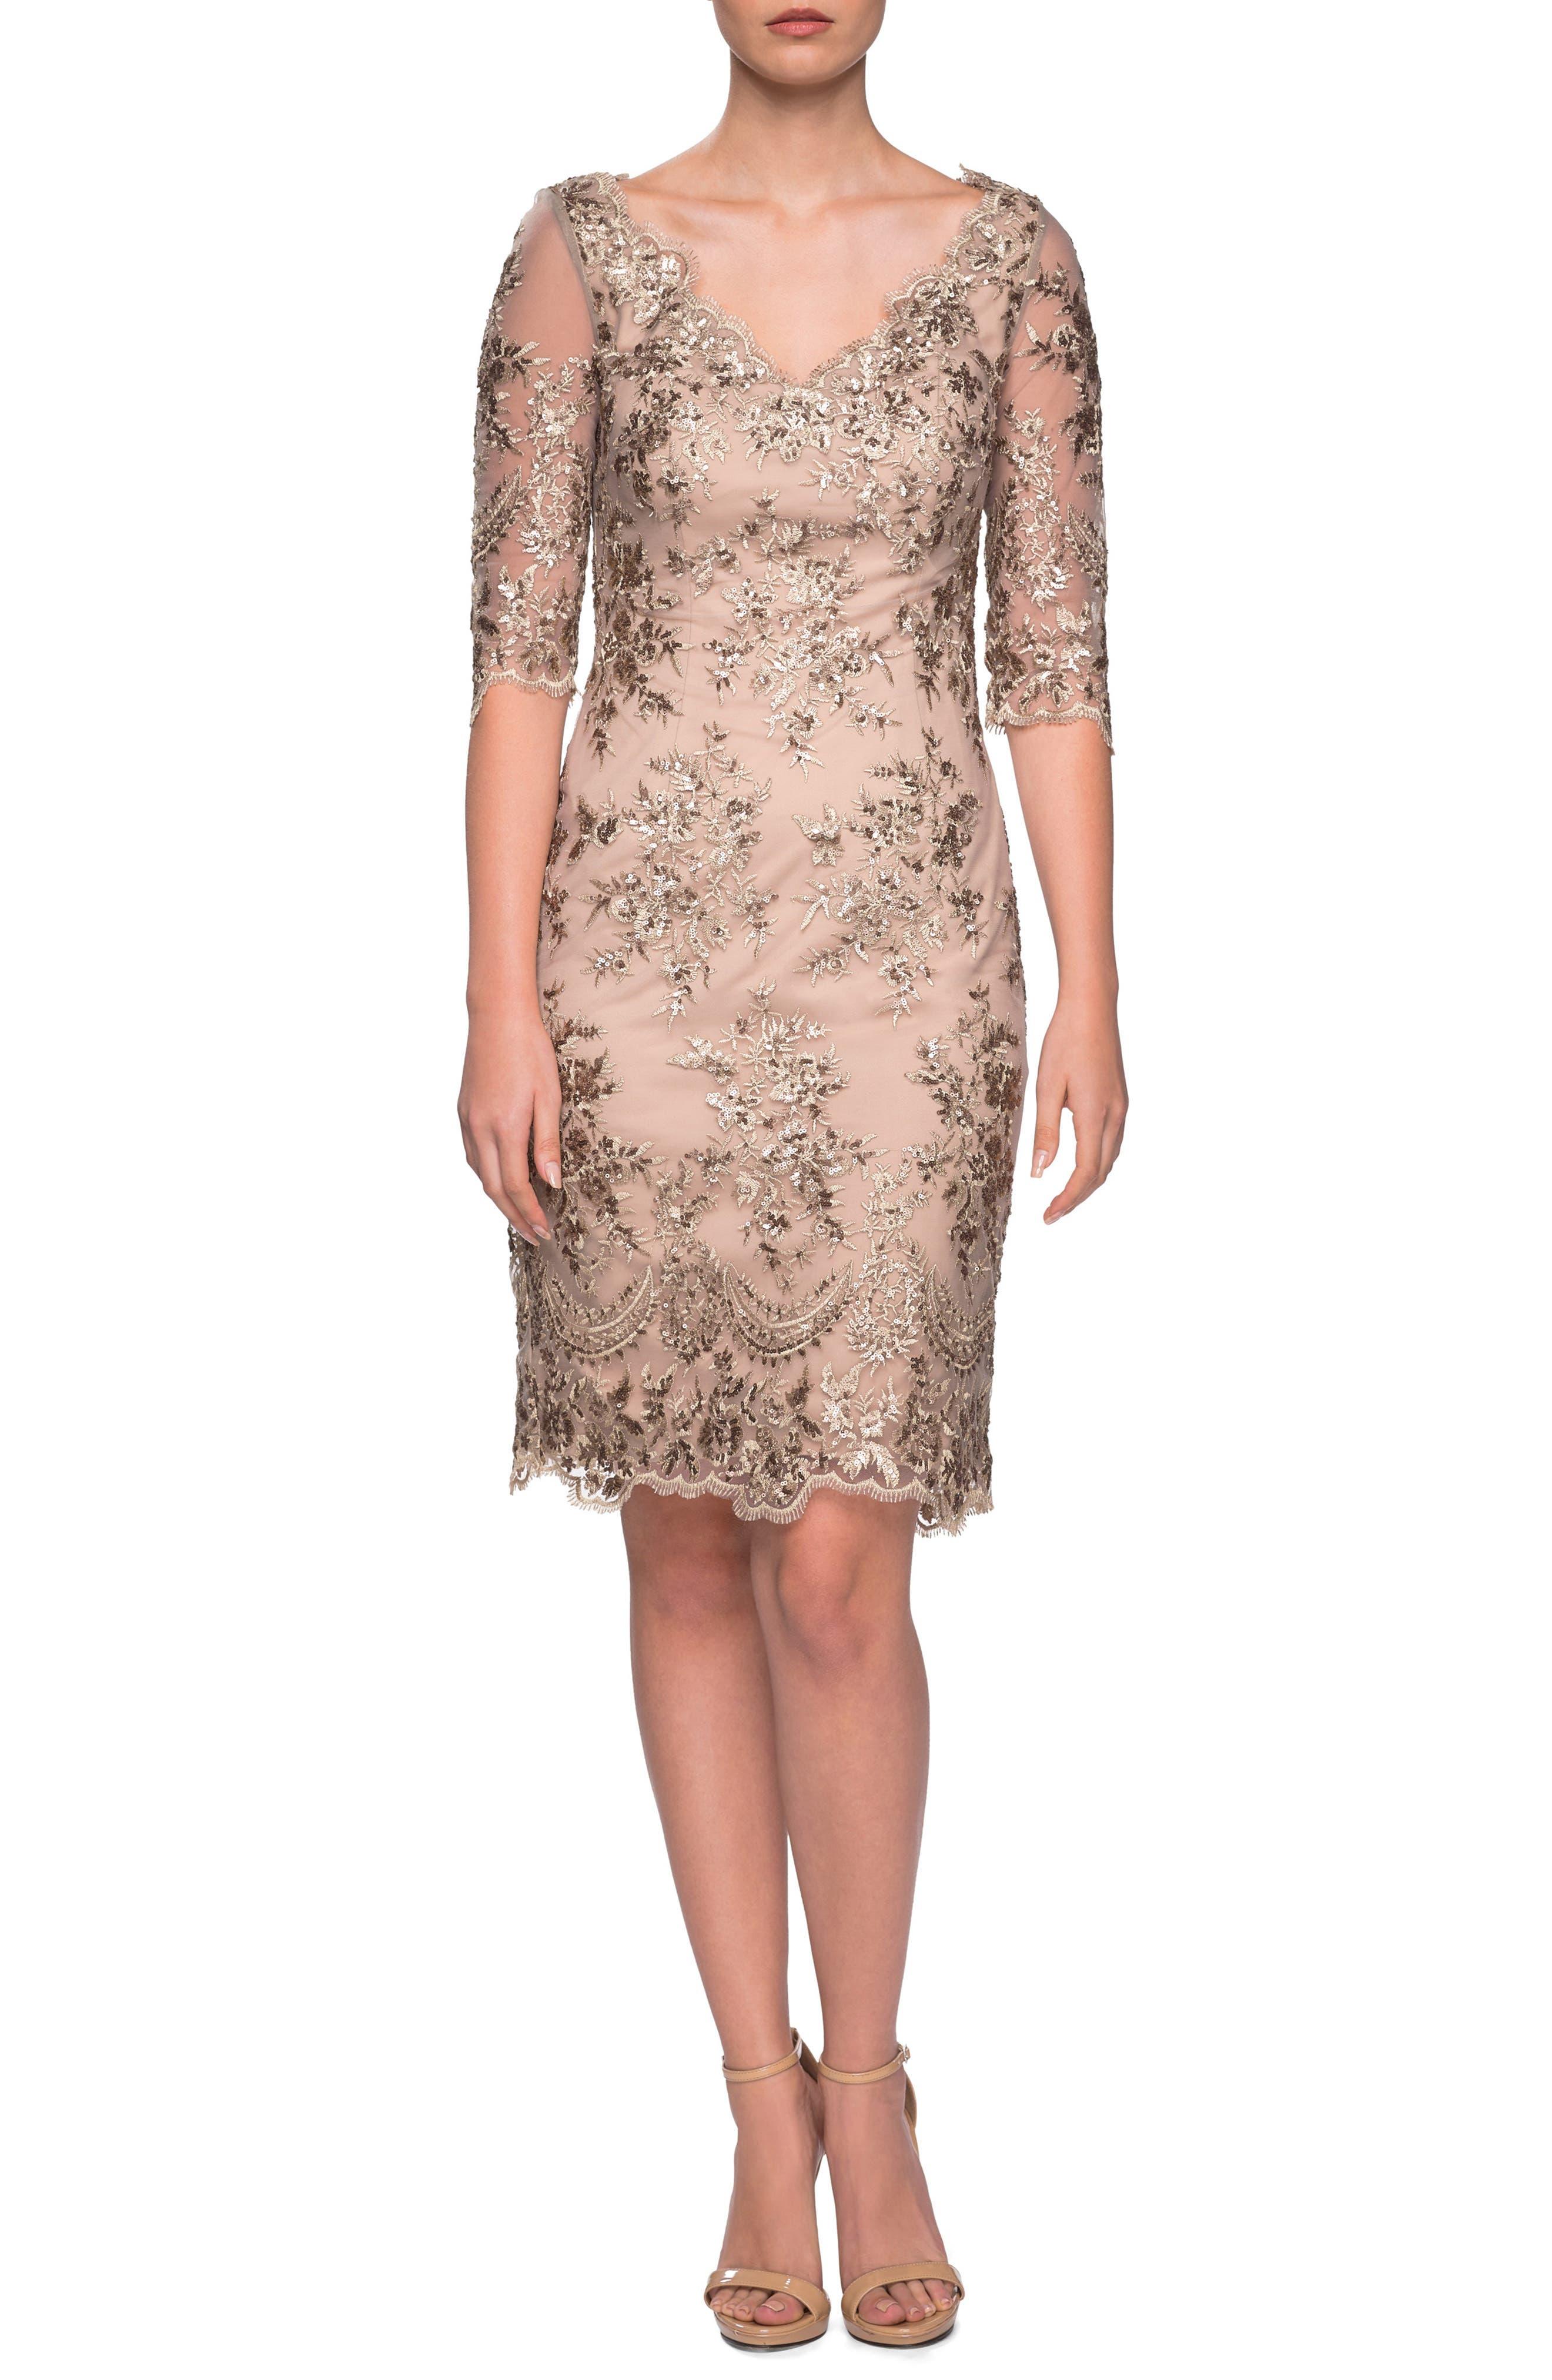 LA FEMME Embroidered Lace Sheath Dress, Main, color, GOLD/ NUDE